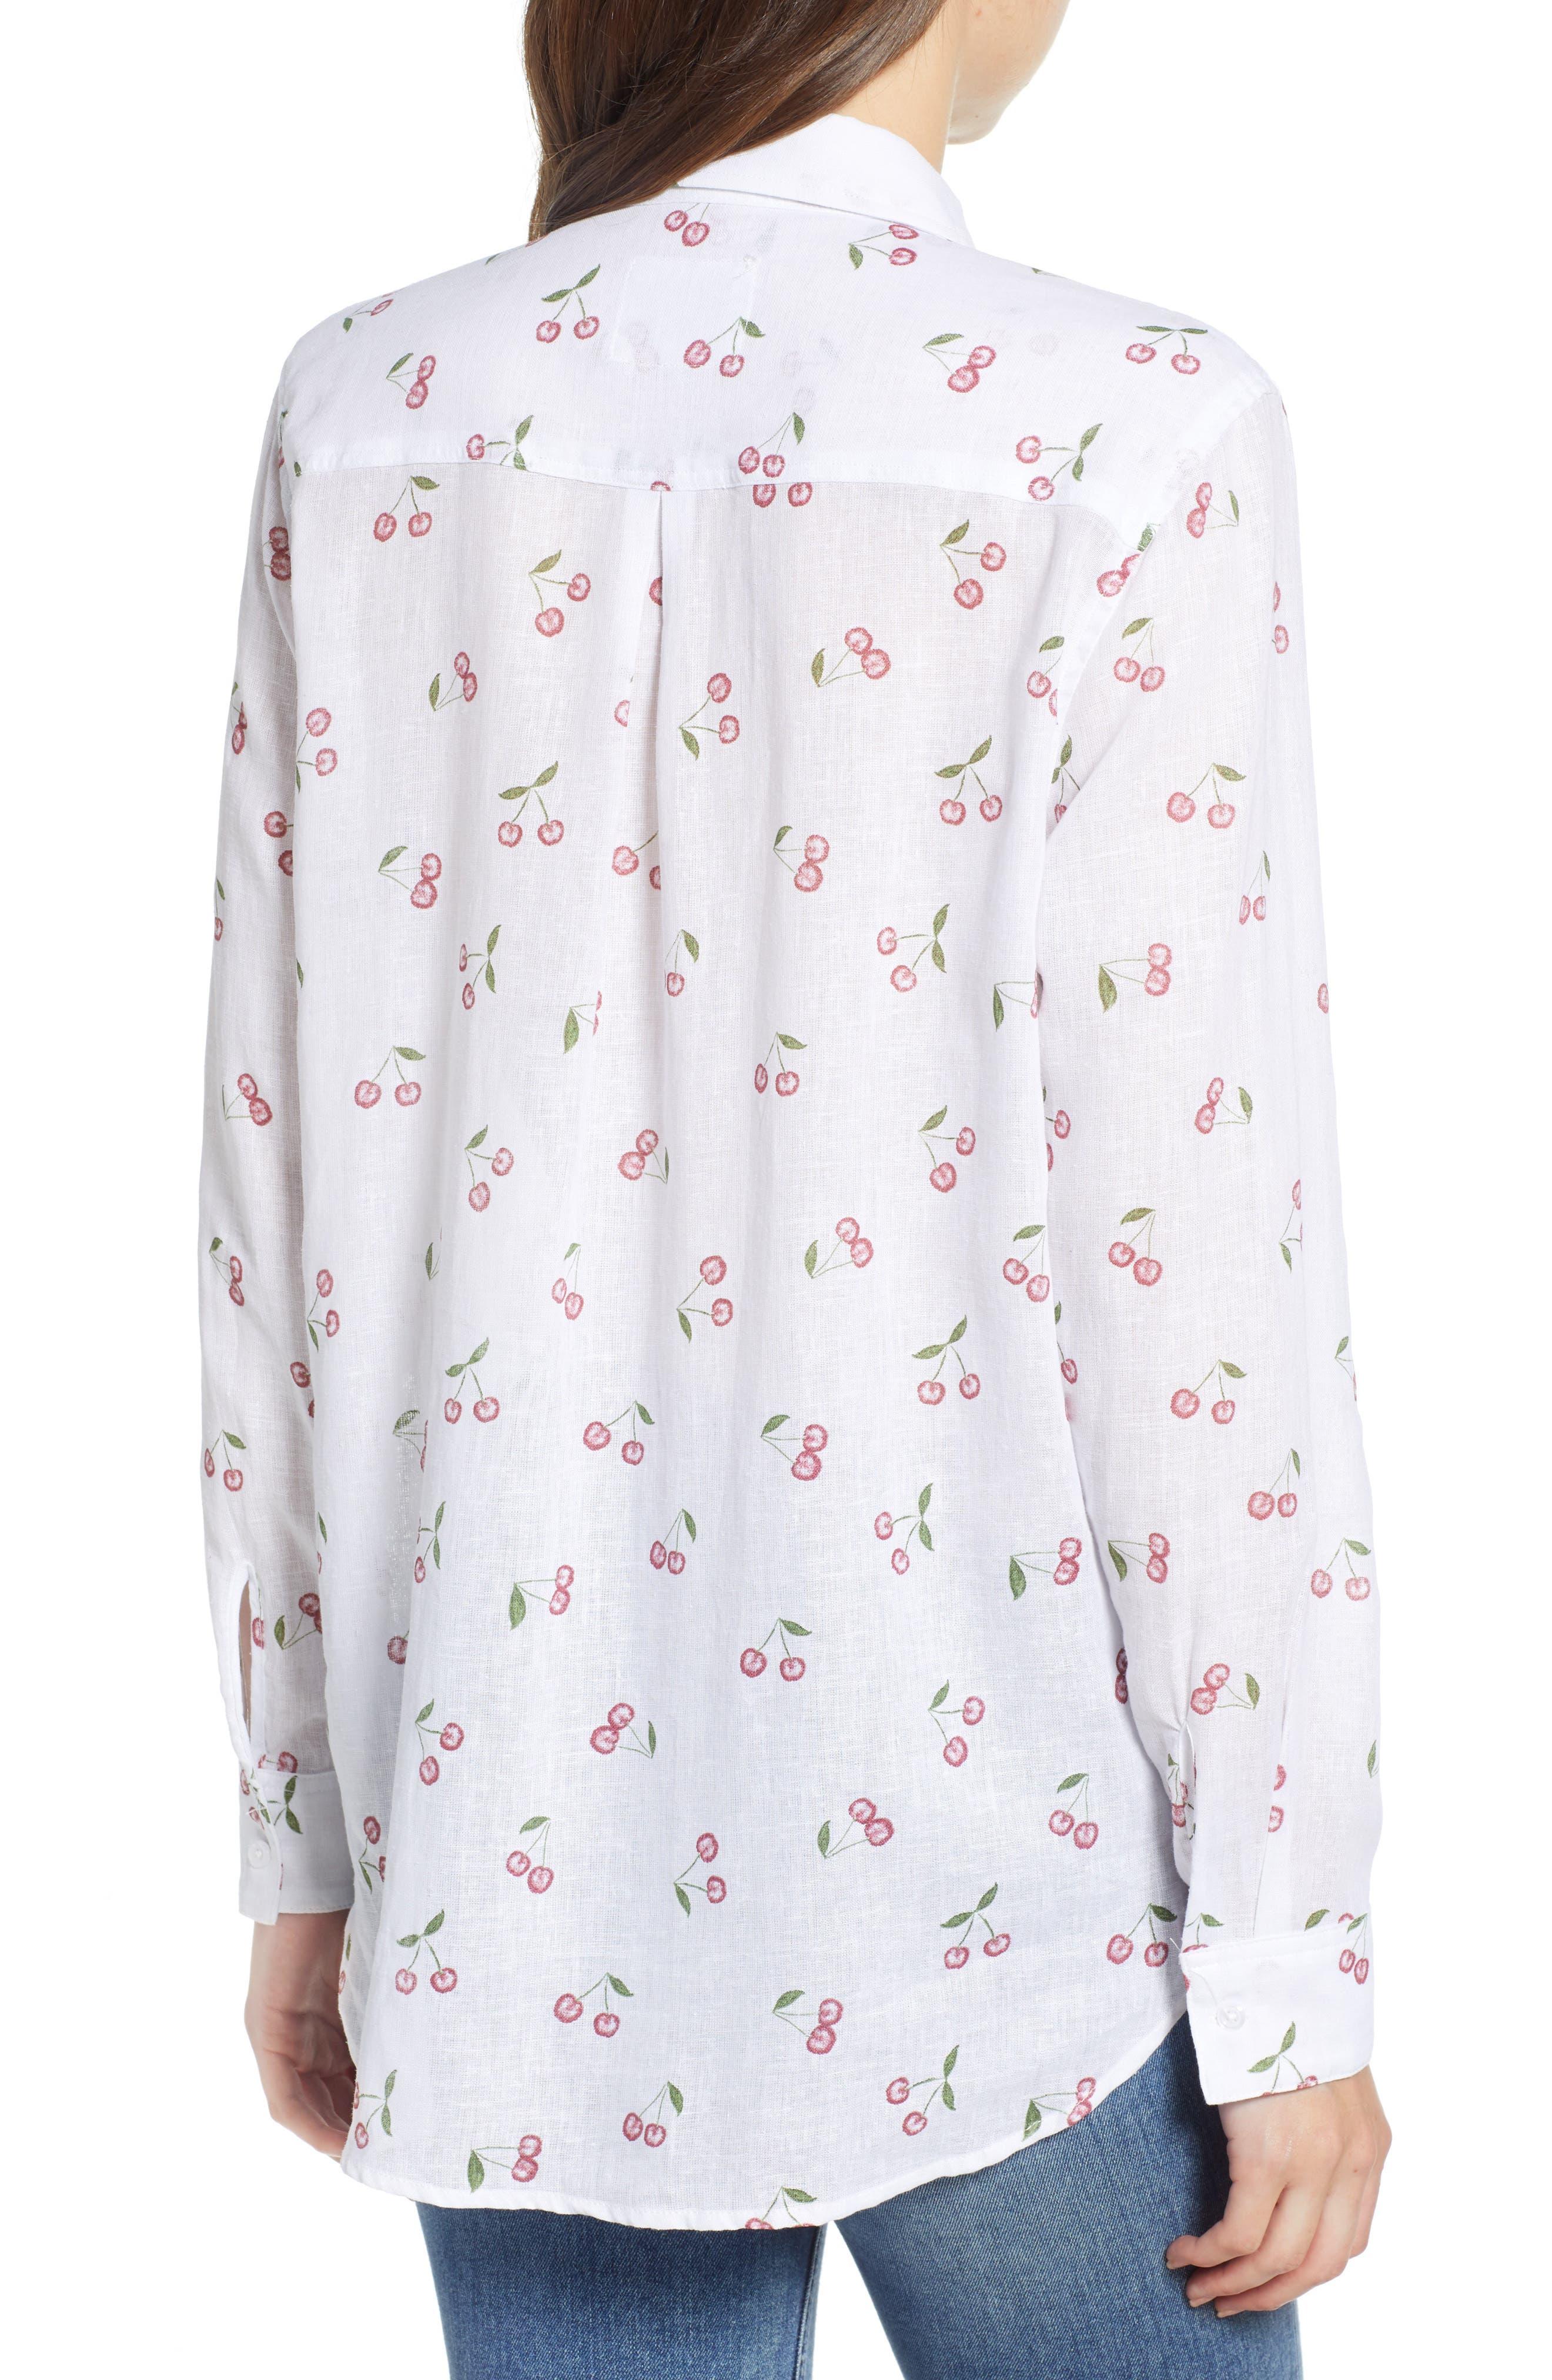 Charli Shirt,                             Alternate thumbnail 2, color,                             White Cherries